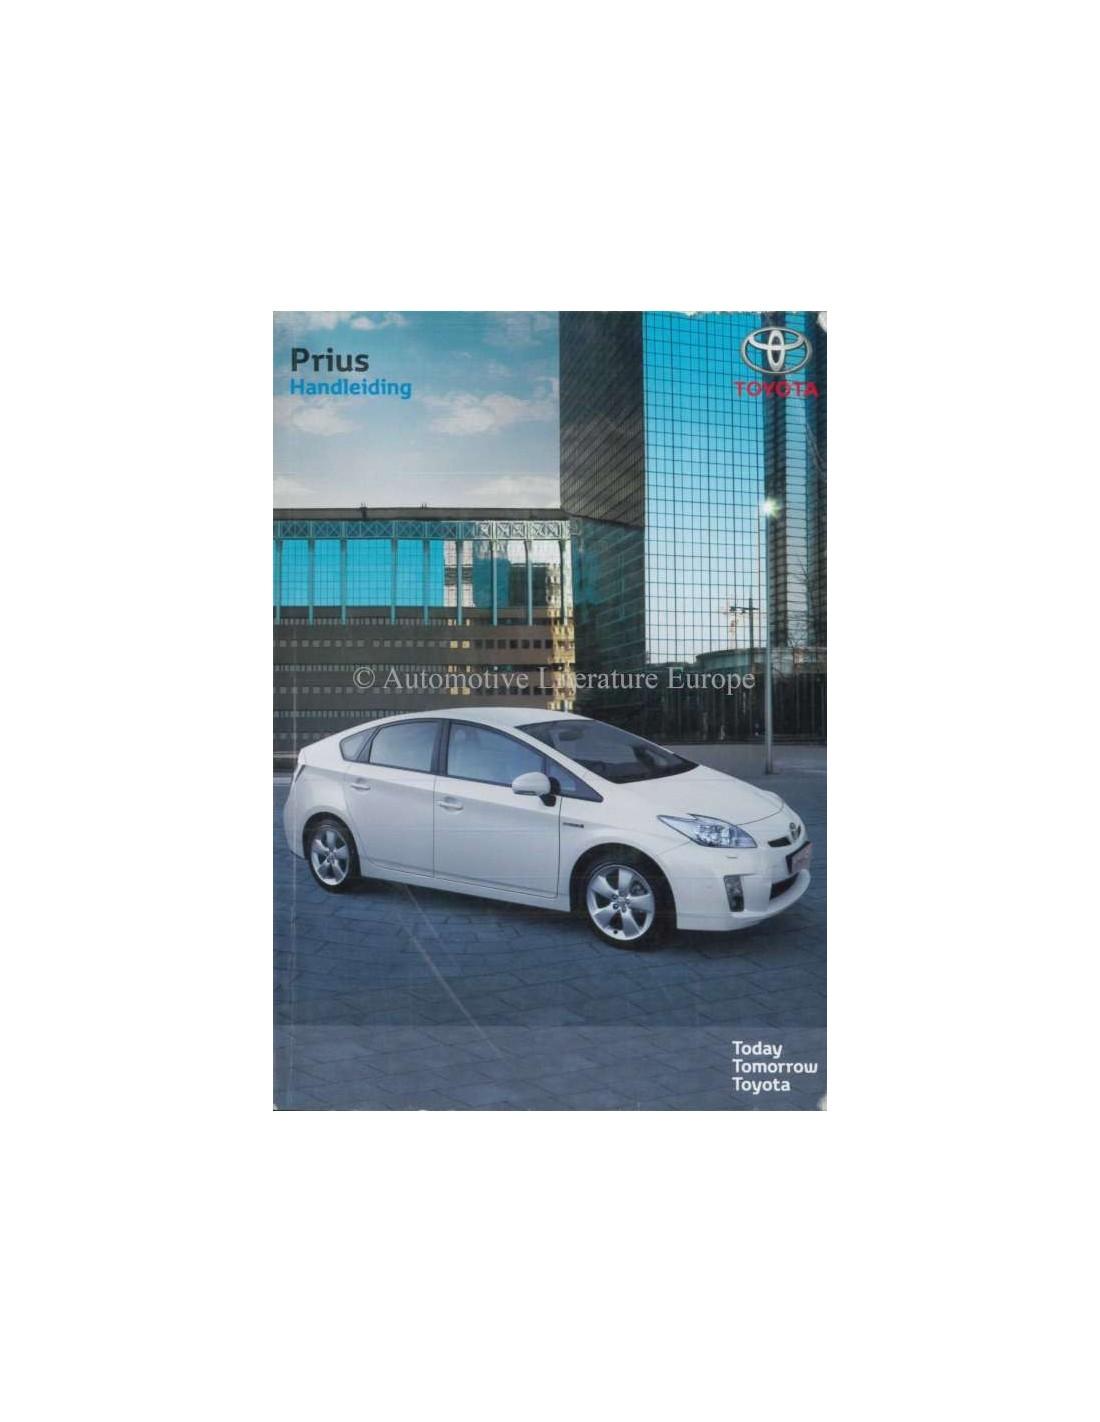 2009 toyota prius owners manual dutch rh autolit eu 2008 prius owners manual download 2009 prius owners manual pdf